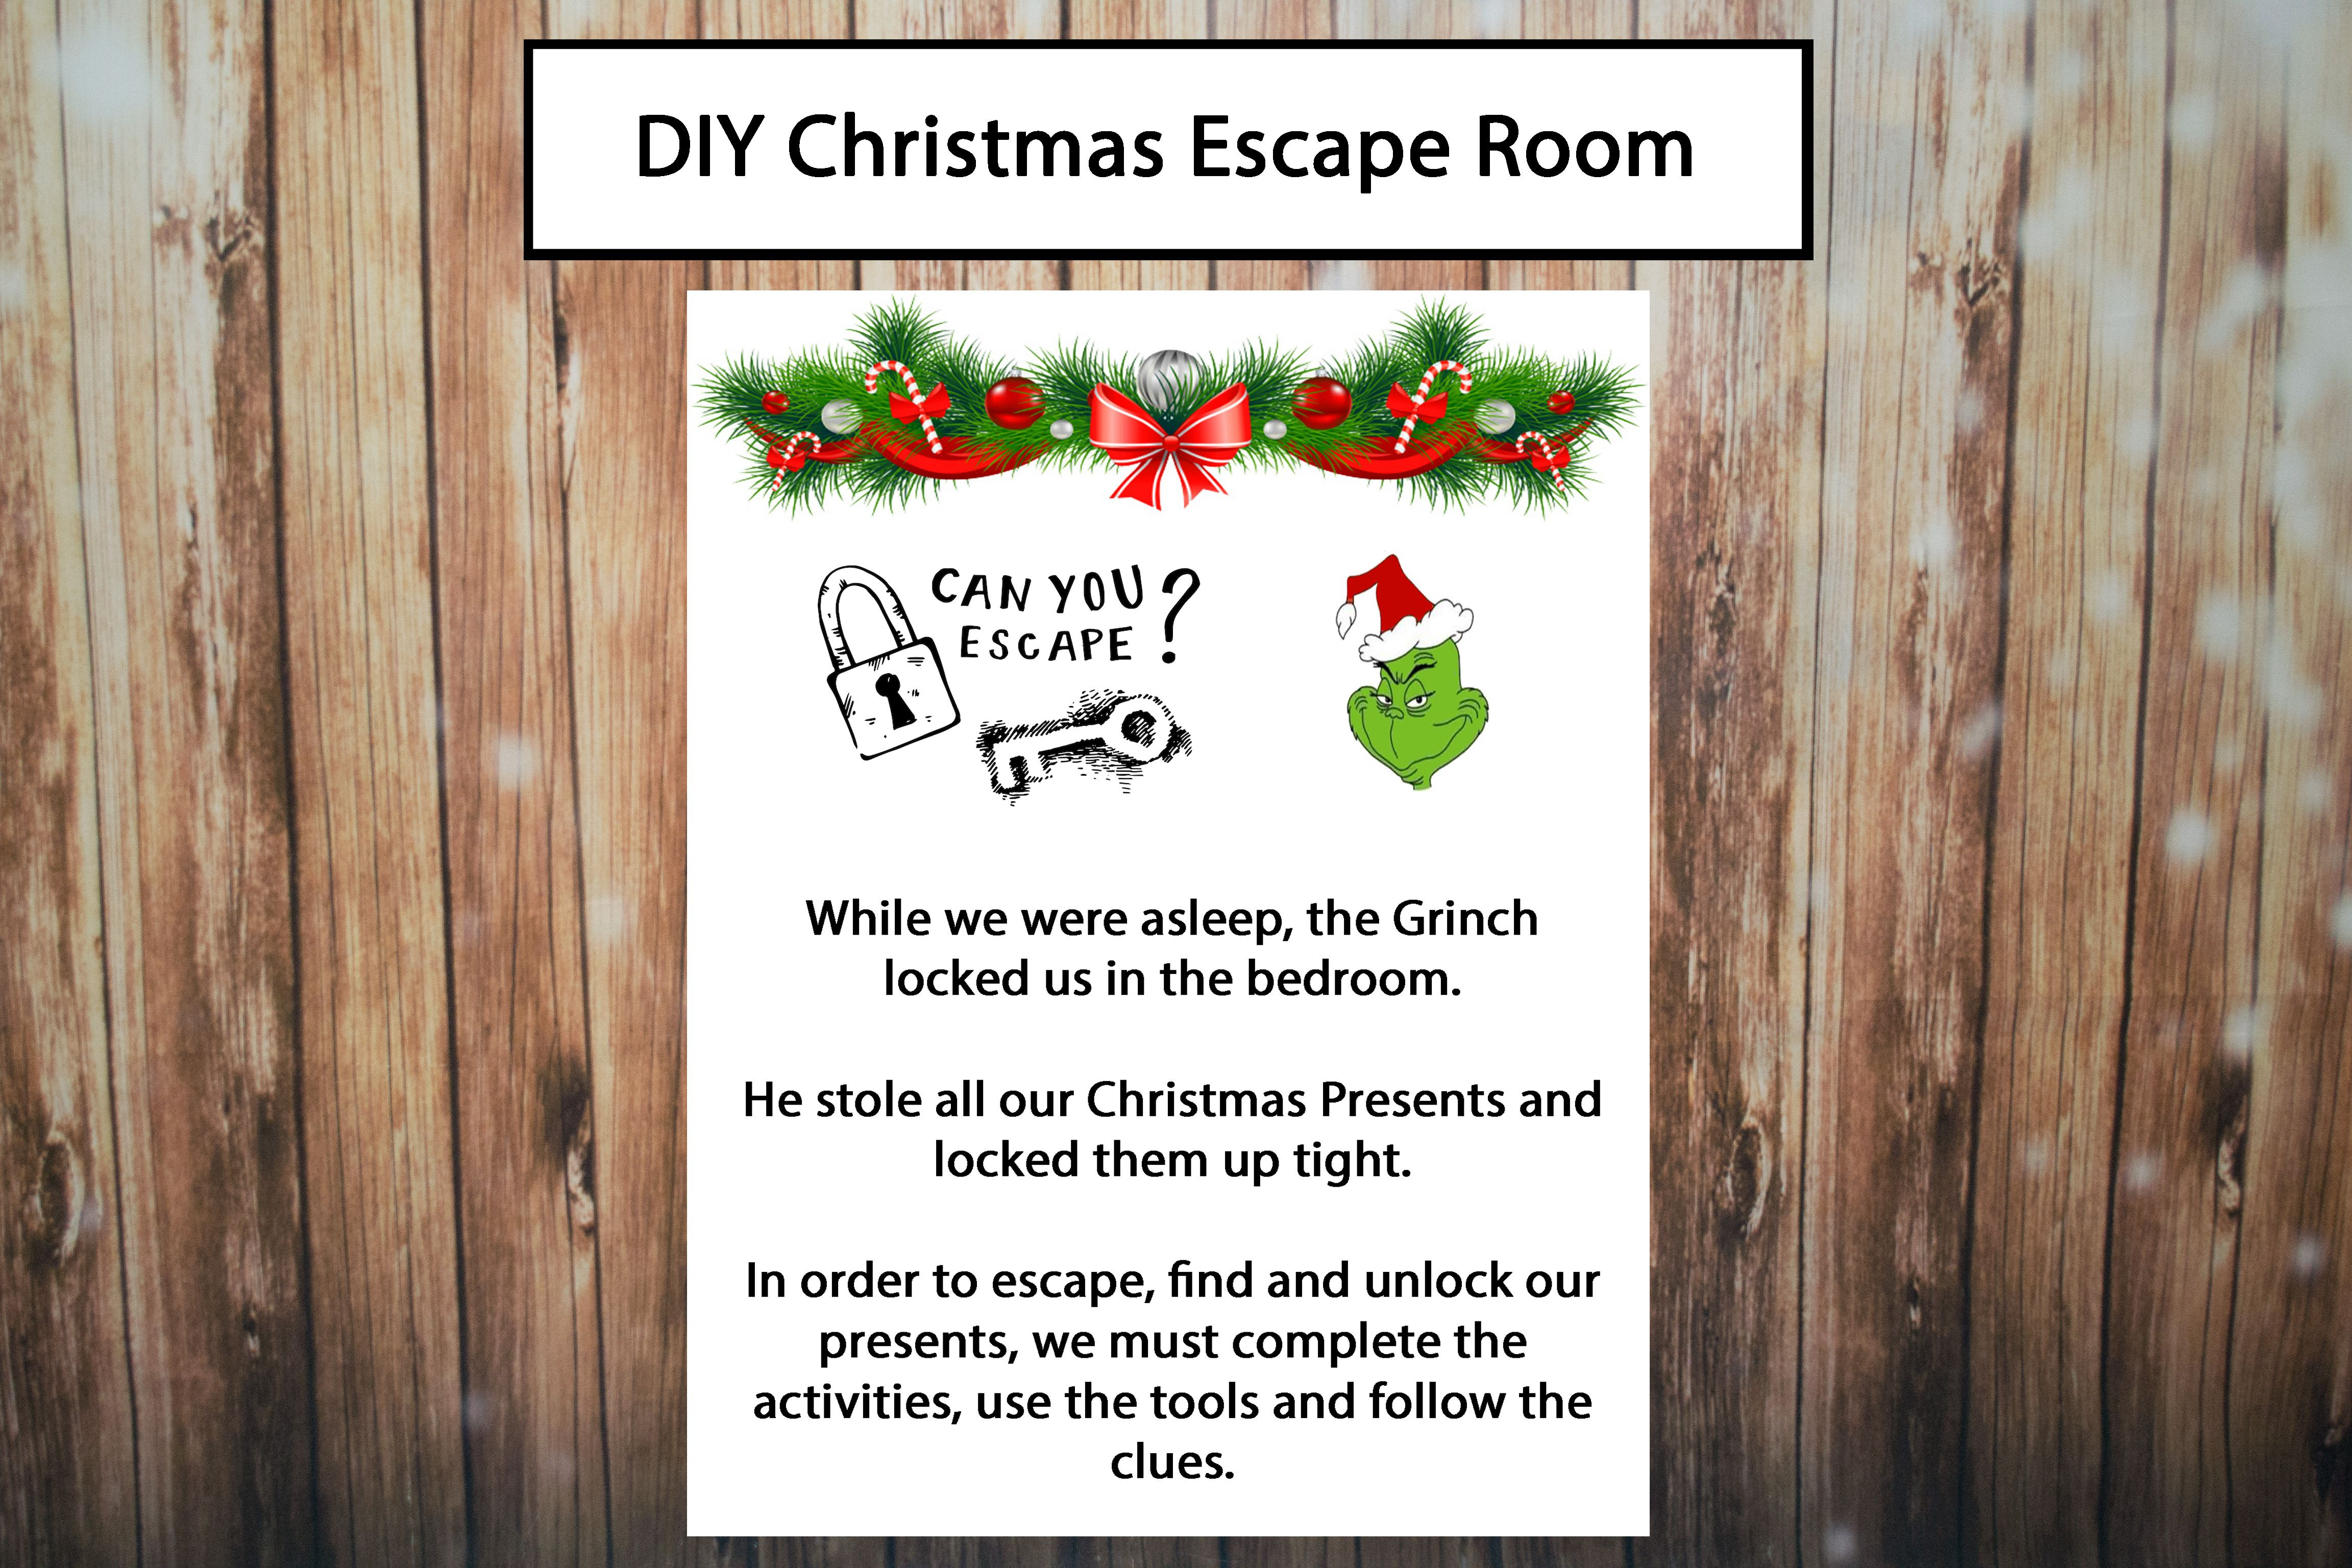 Christmas Escape Room, DIY Escape Room, Kids Party Escape